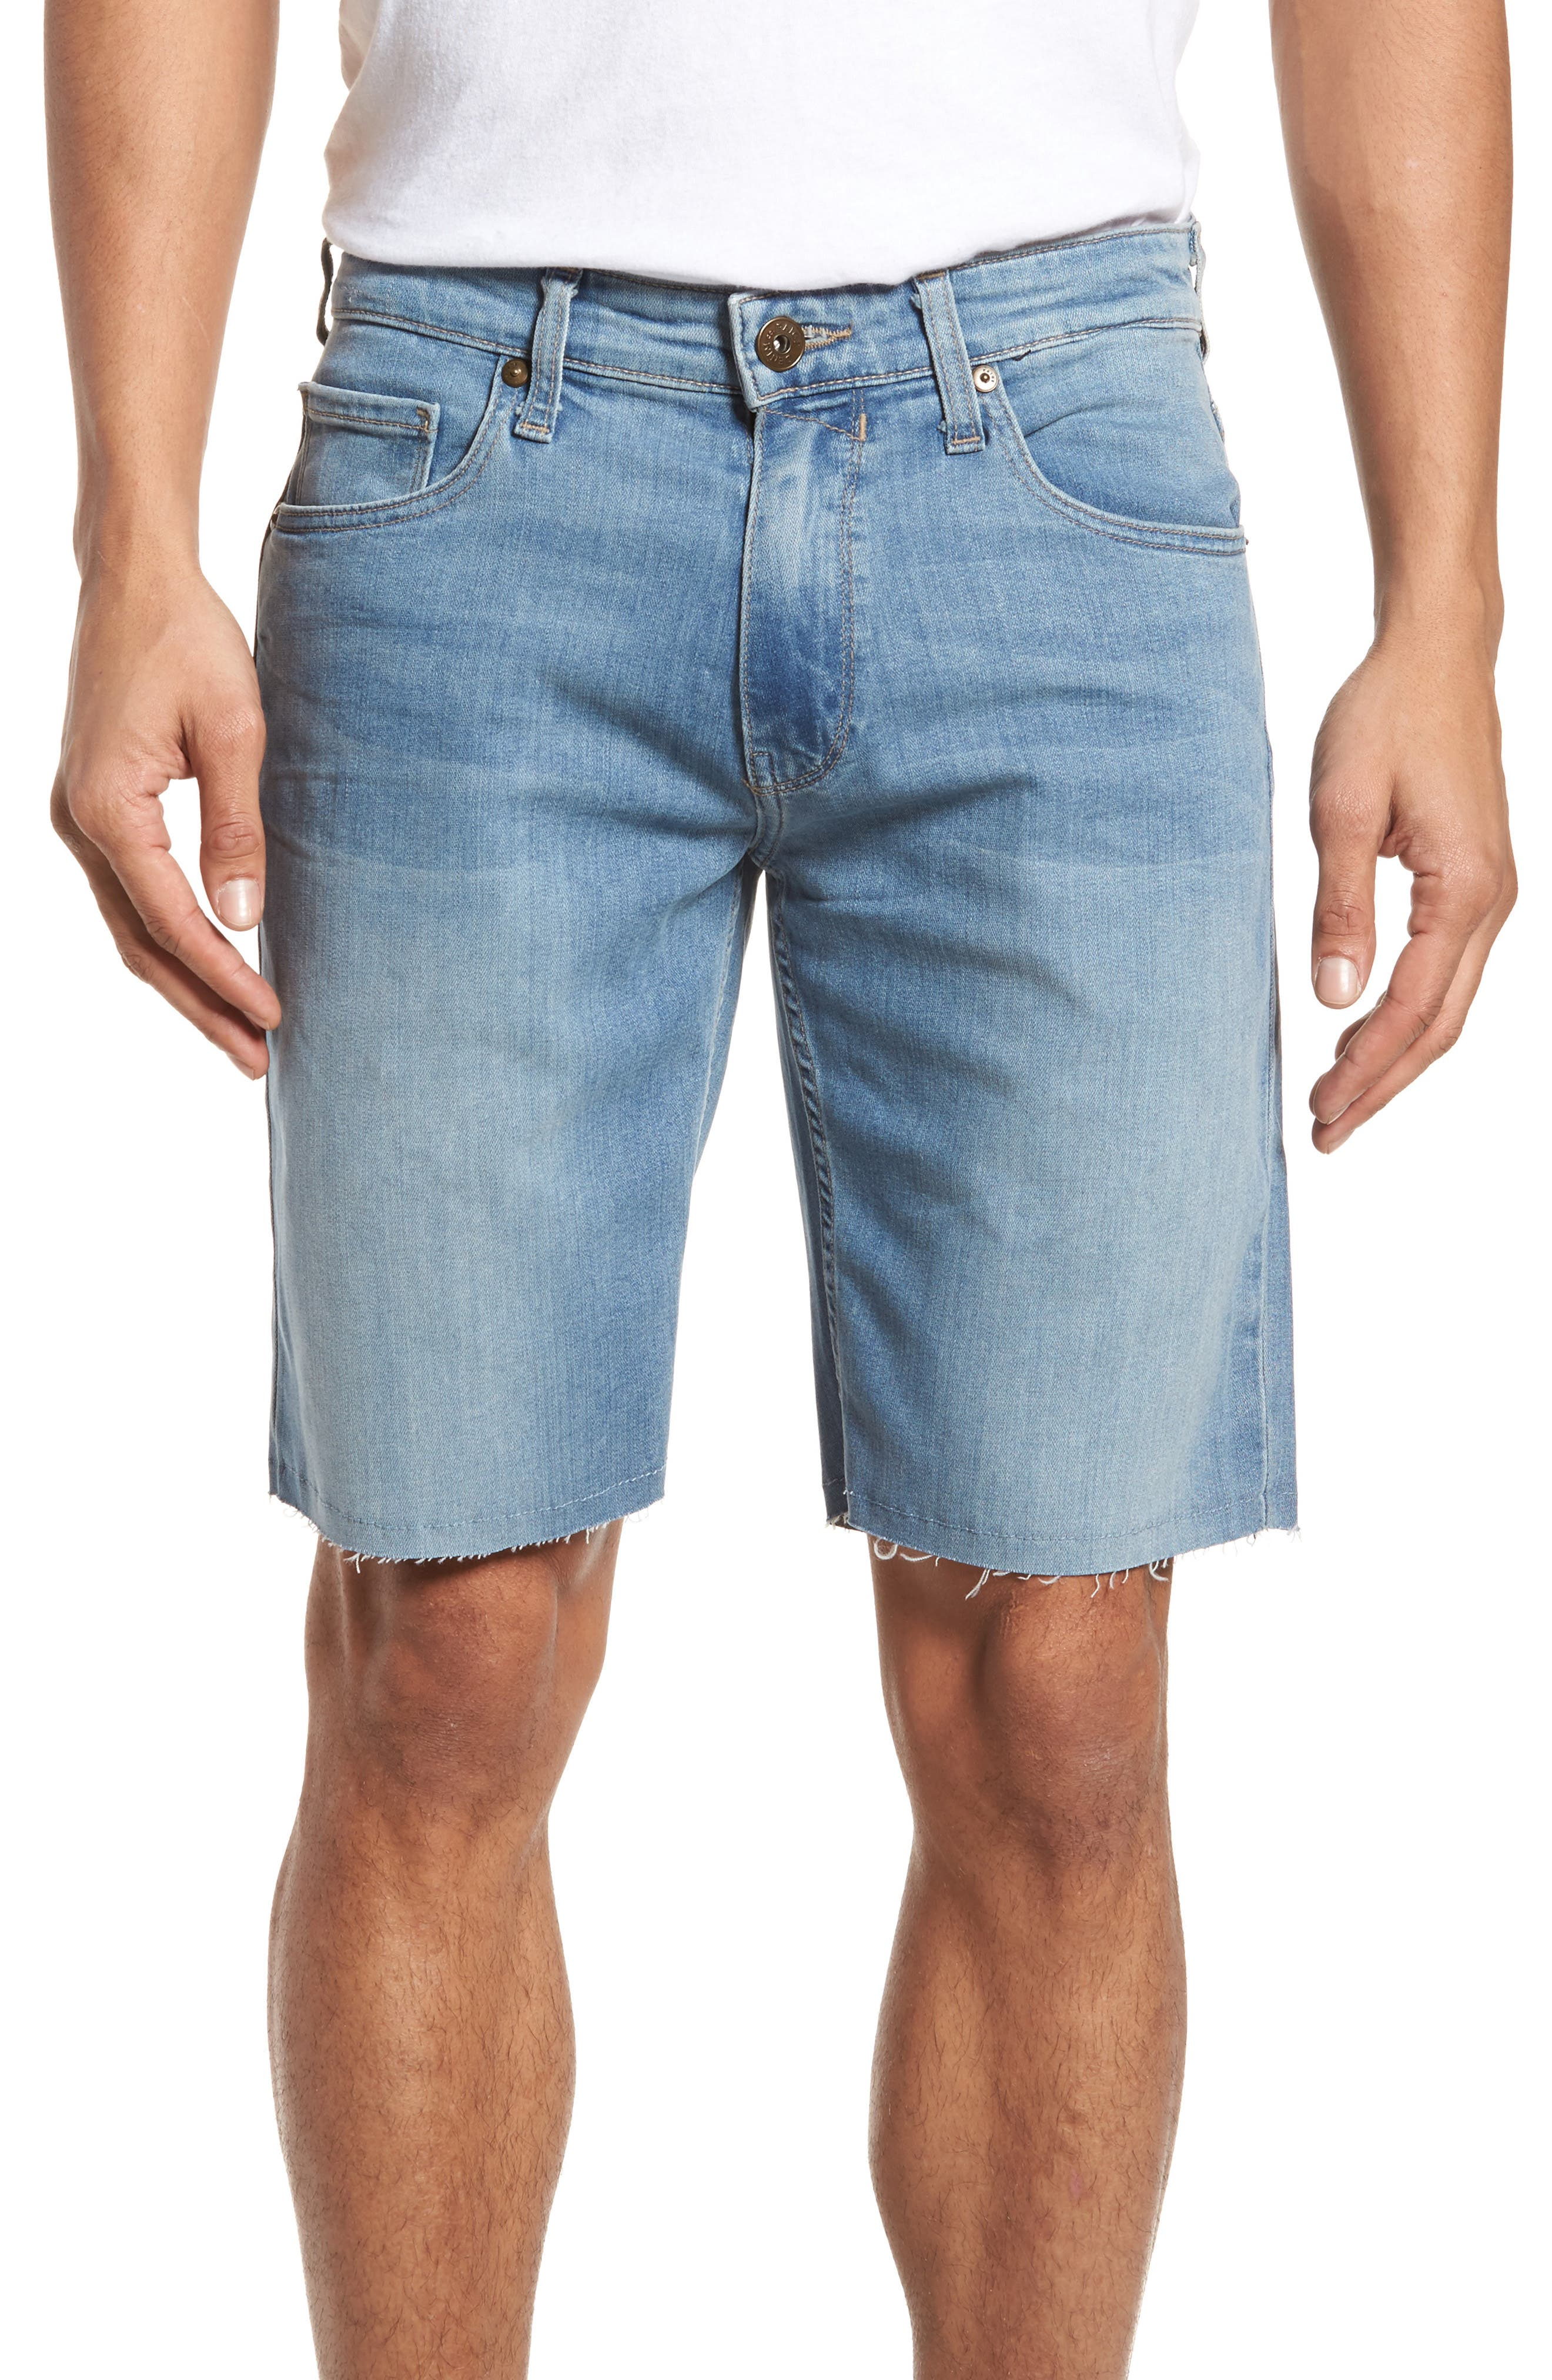 Transcend - Federal Slim Straight Leg Denim Shorts,                             Main thumbnail 1, color,                             Roller